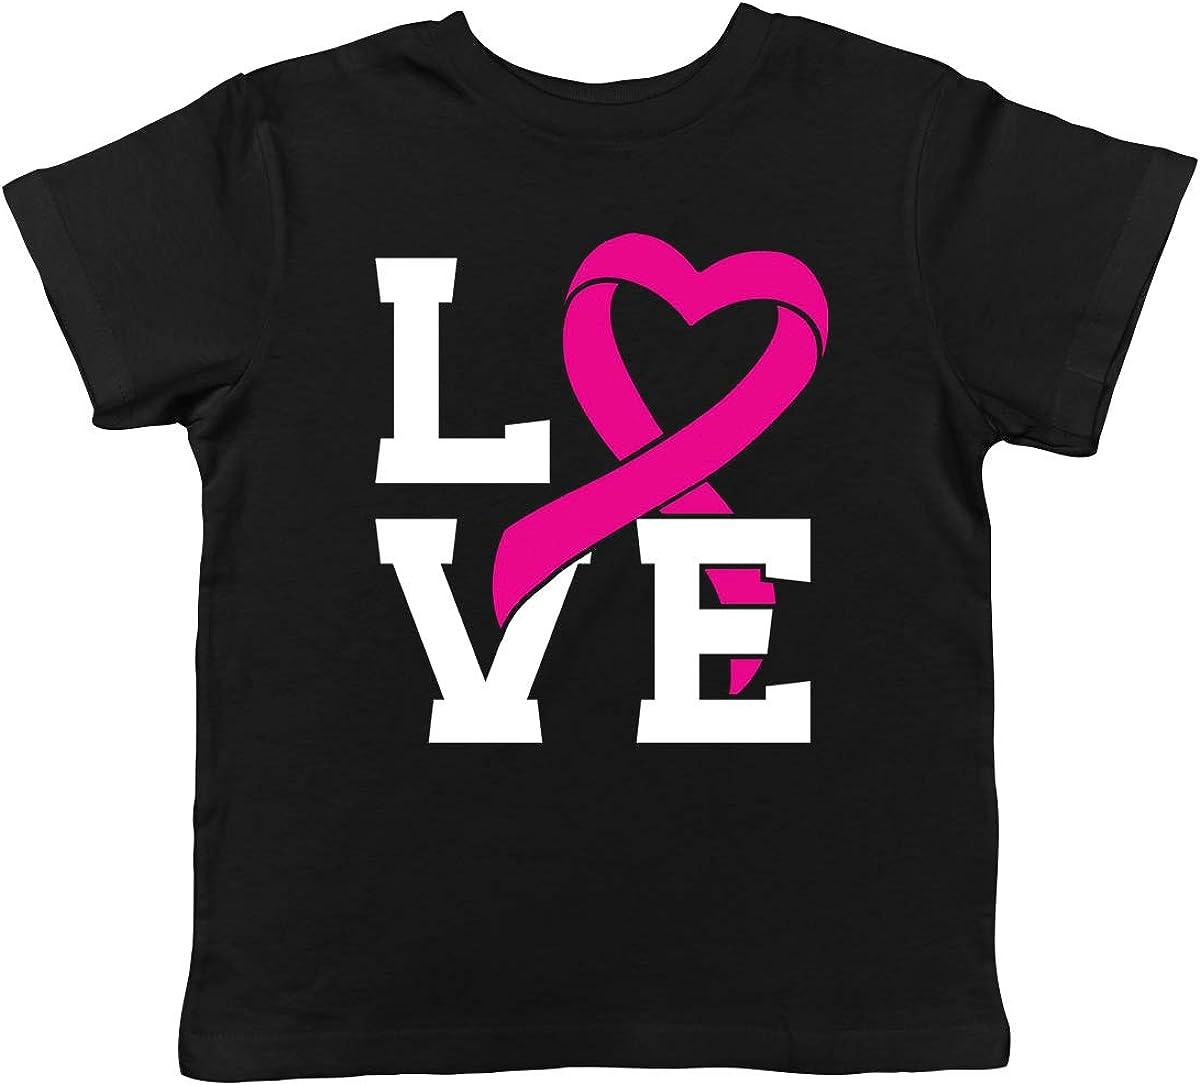 Pink Ribbon Flag Breast Cancer Awareness Month October Toddler T-Shirt